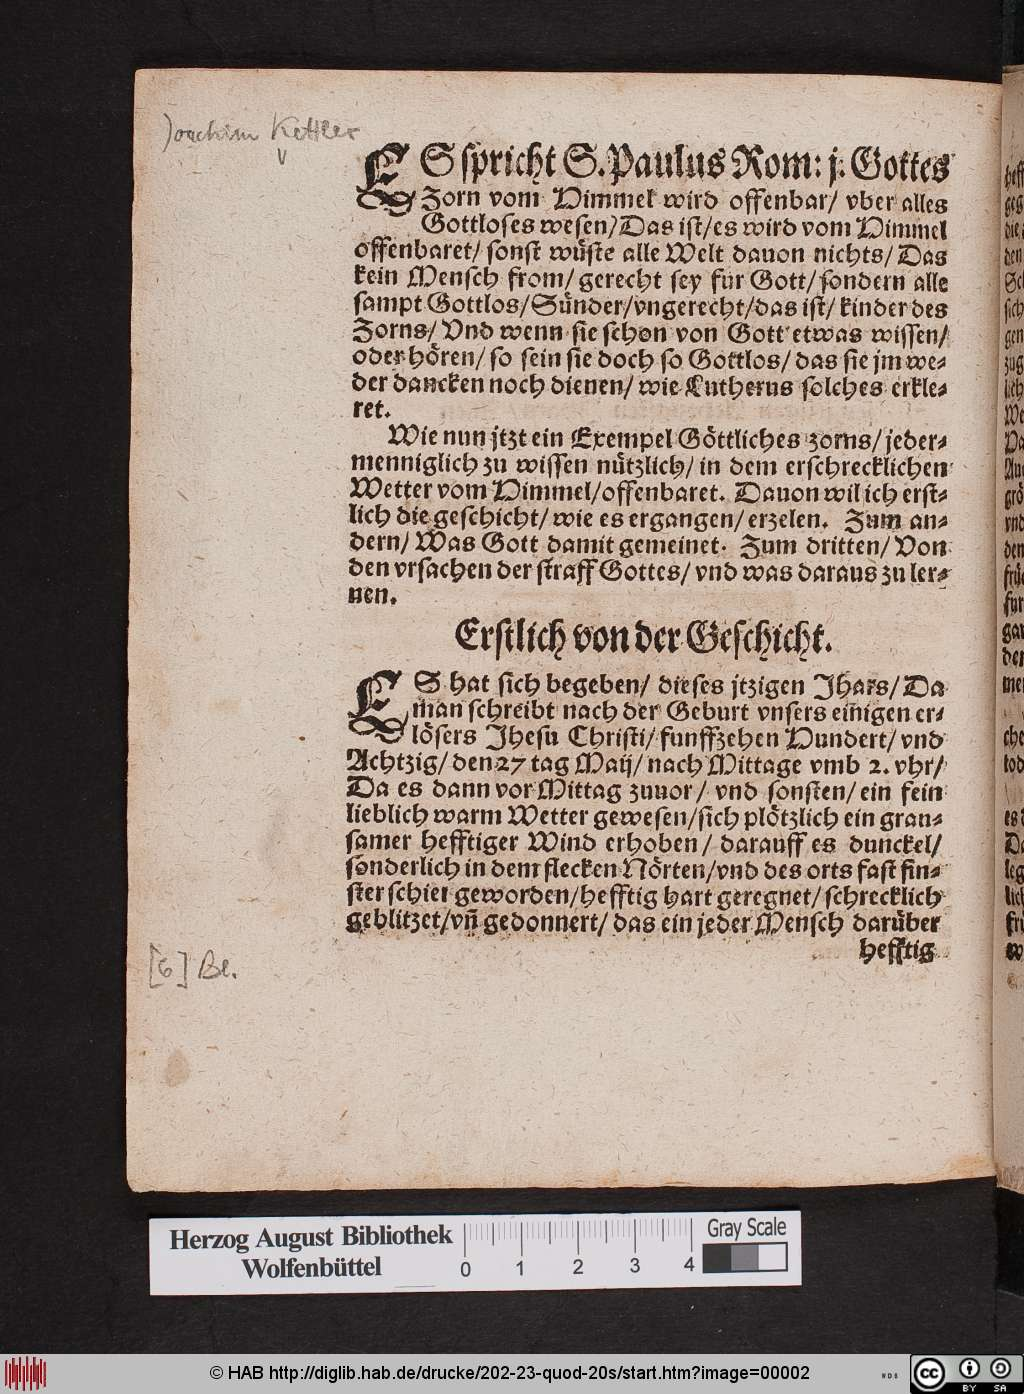 http://diglib.hab.de/drucke/202-23-quod-20s/00002.jpg